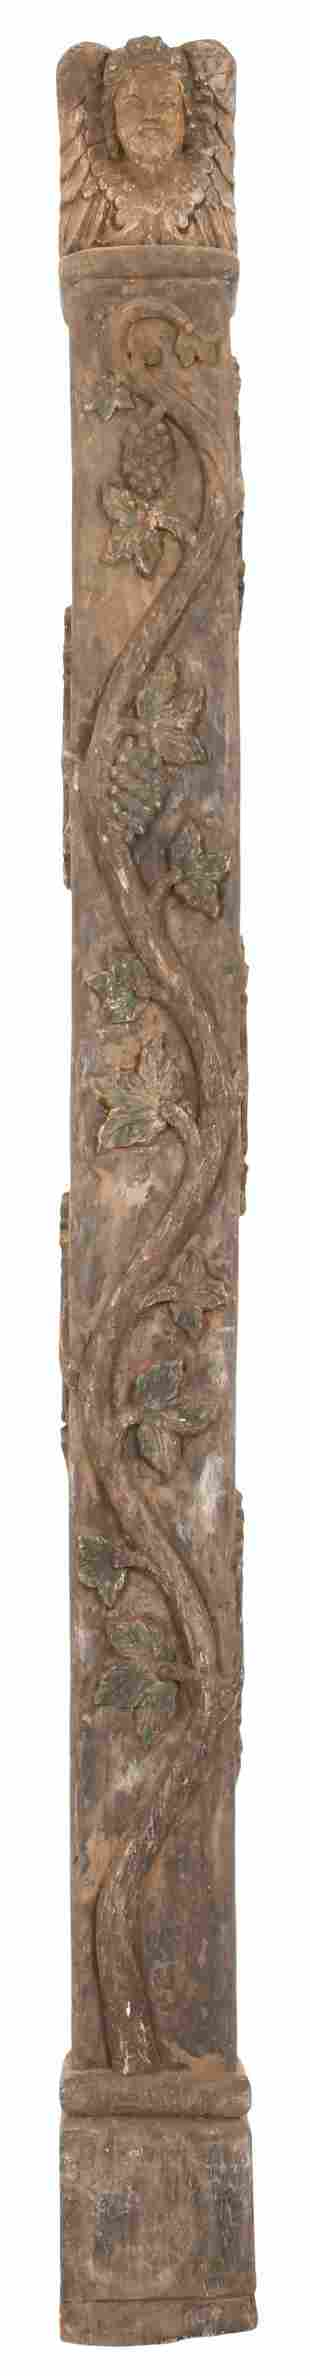 19th Century Carved Wood Pillar